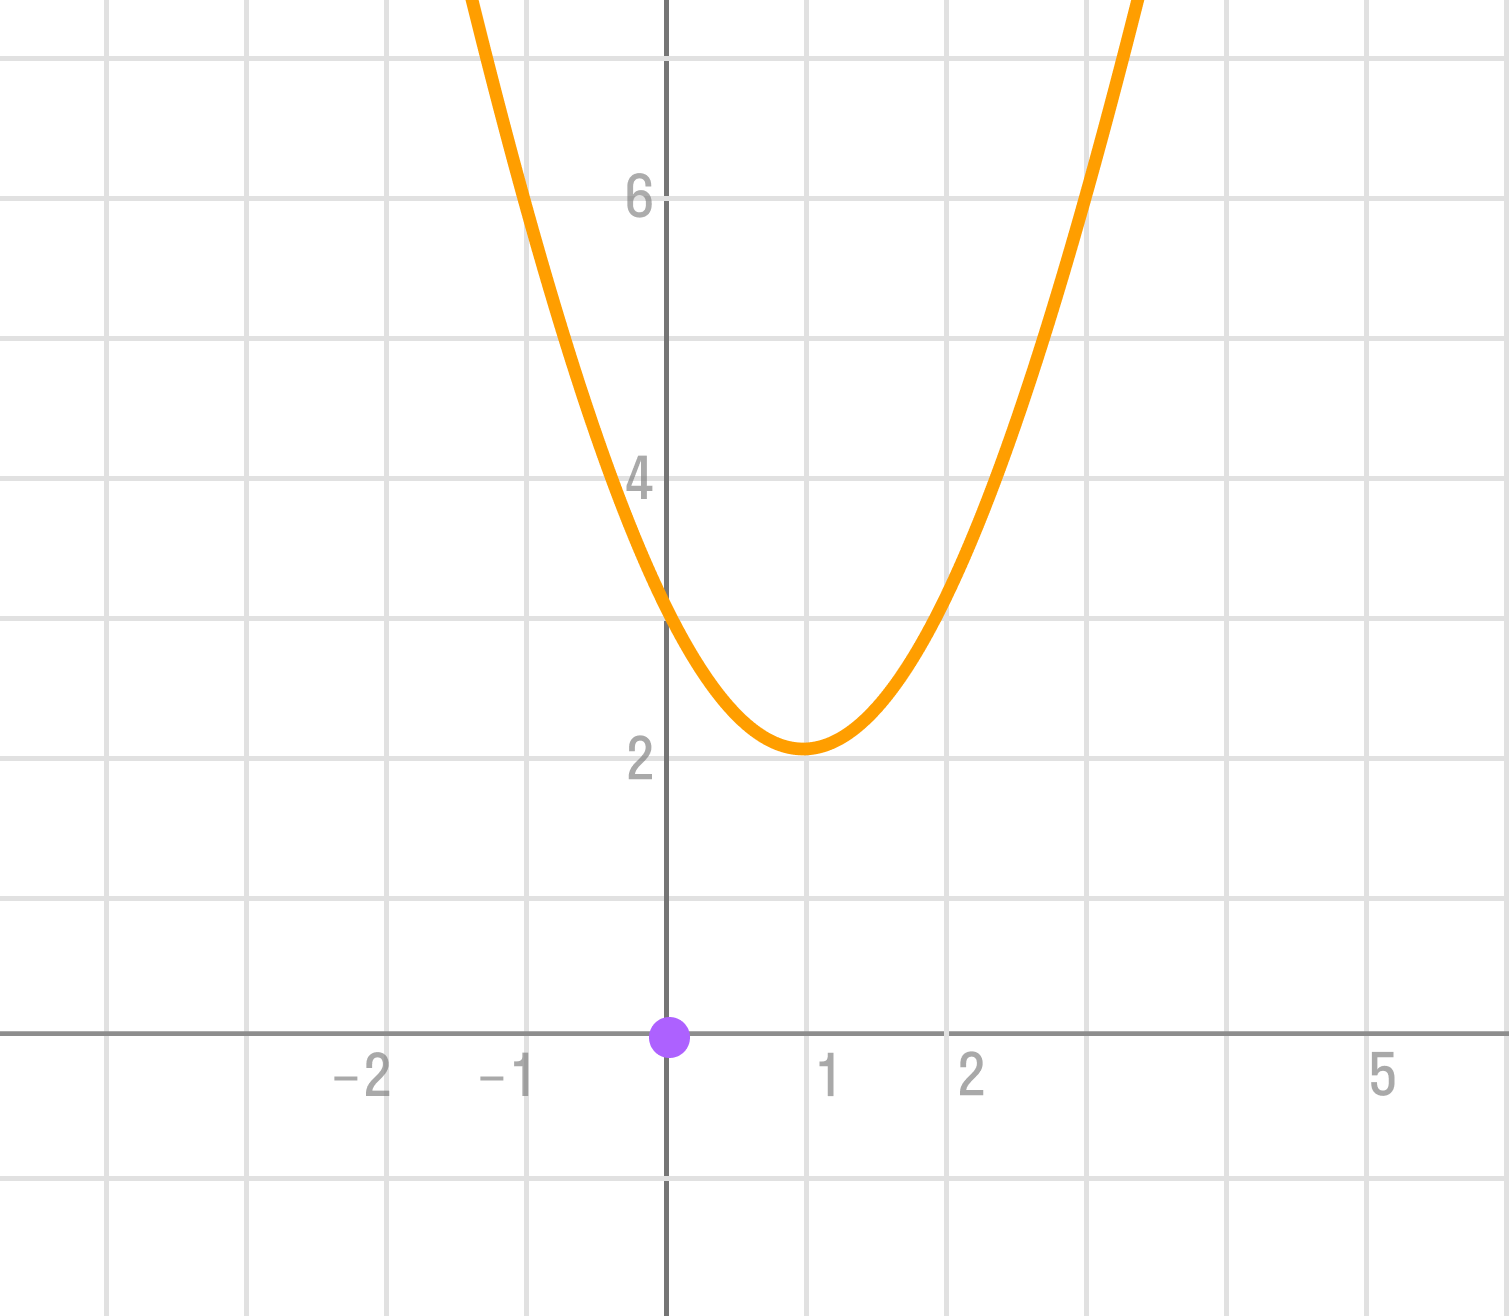 график при условии D < 0